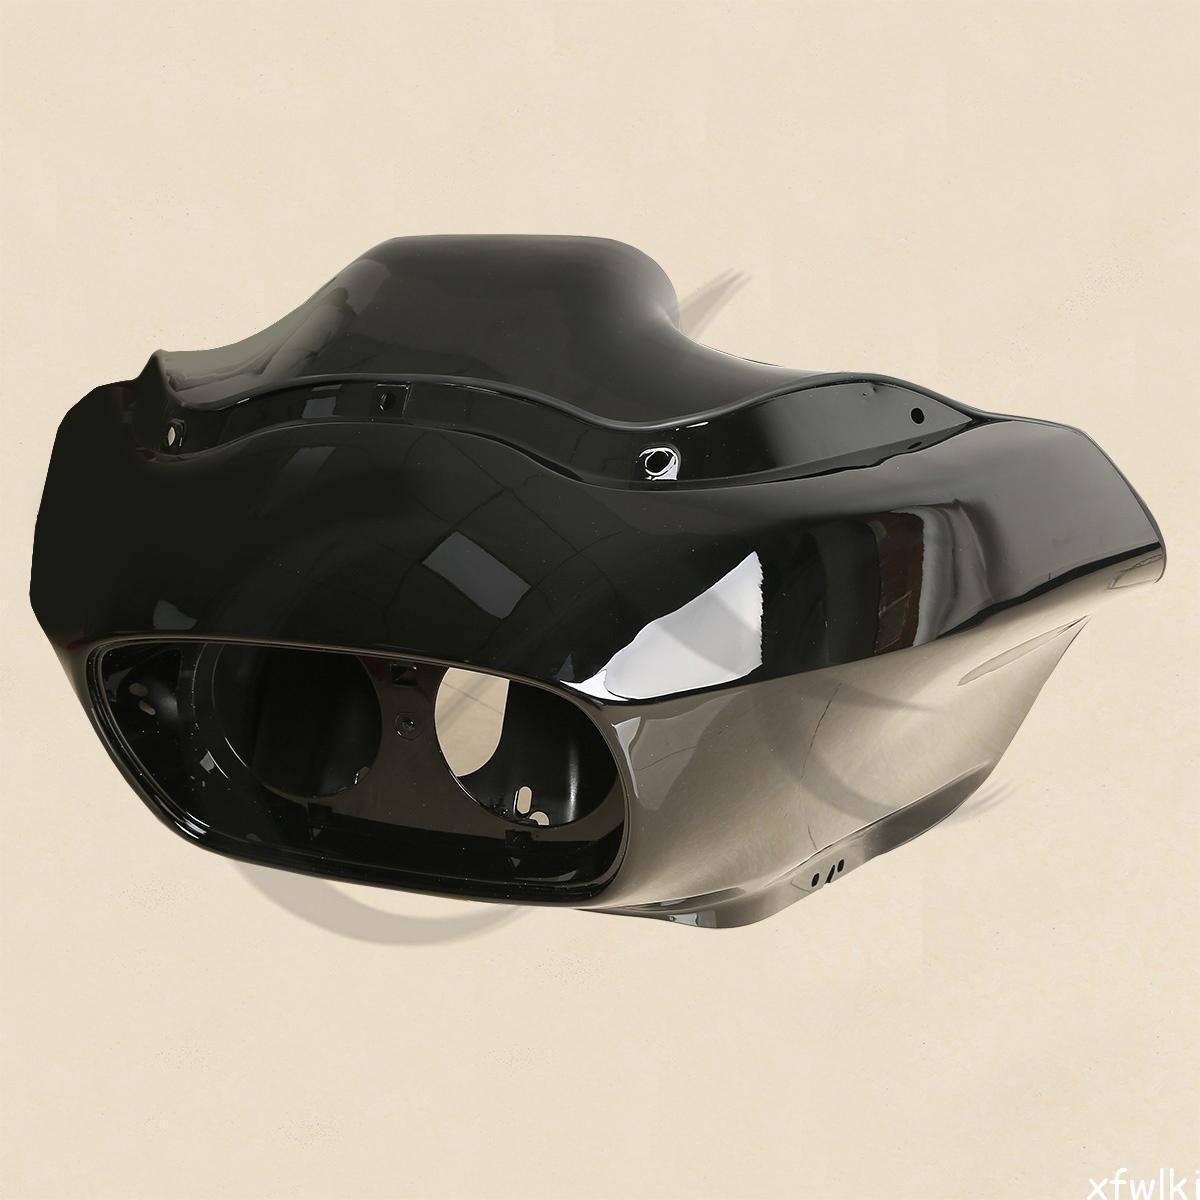 Inner Outer Fairing 5 75 U0026 39  U0026 39  Dual Led Headlights For Harley Road Glide 98